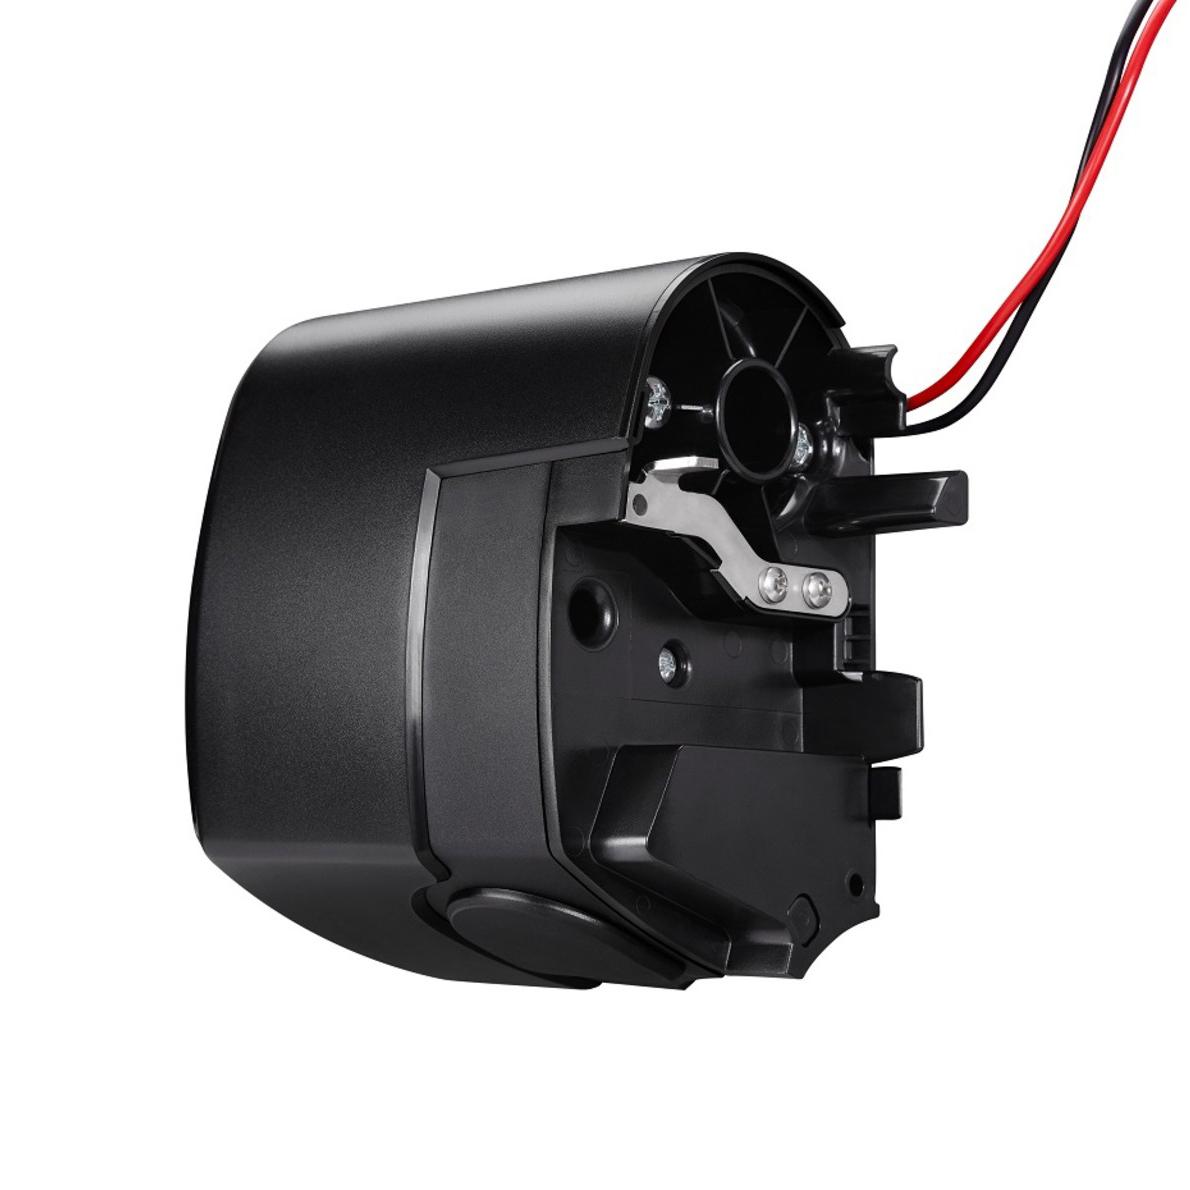 Thule Nachrüst Motor Kit TO 5200 anthrazit 12V